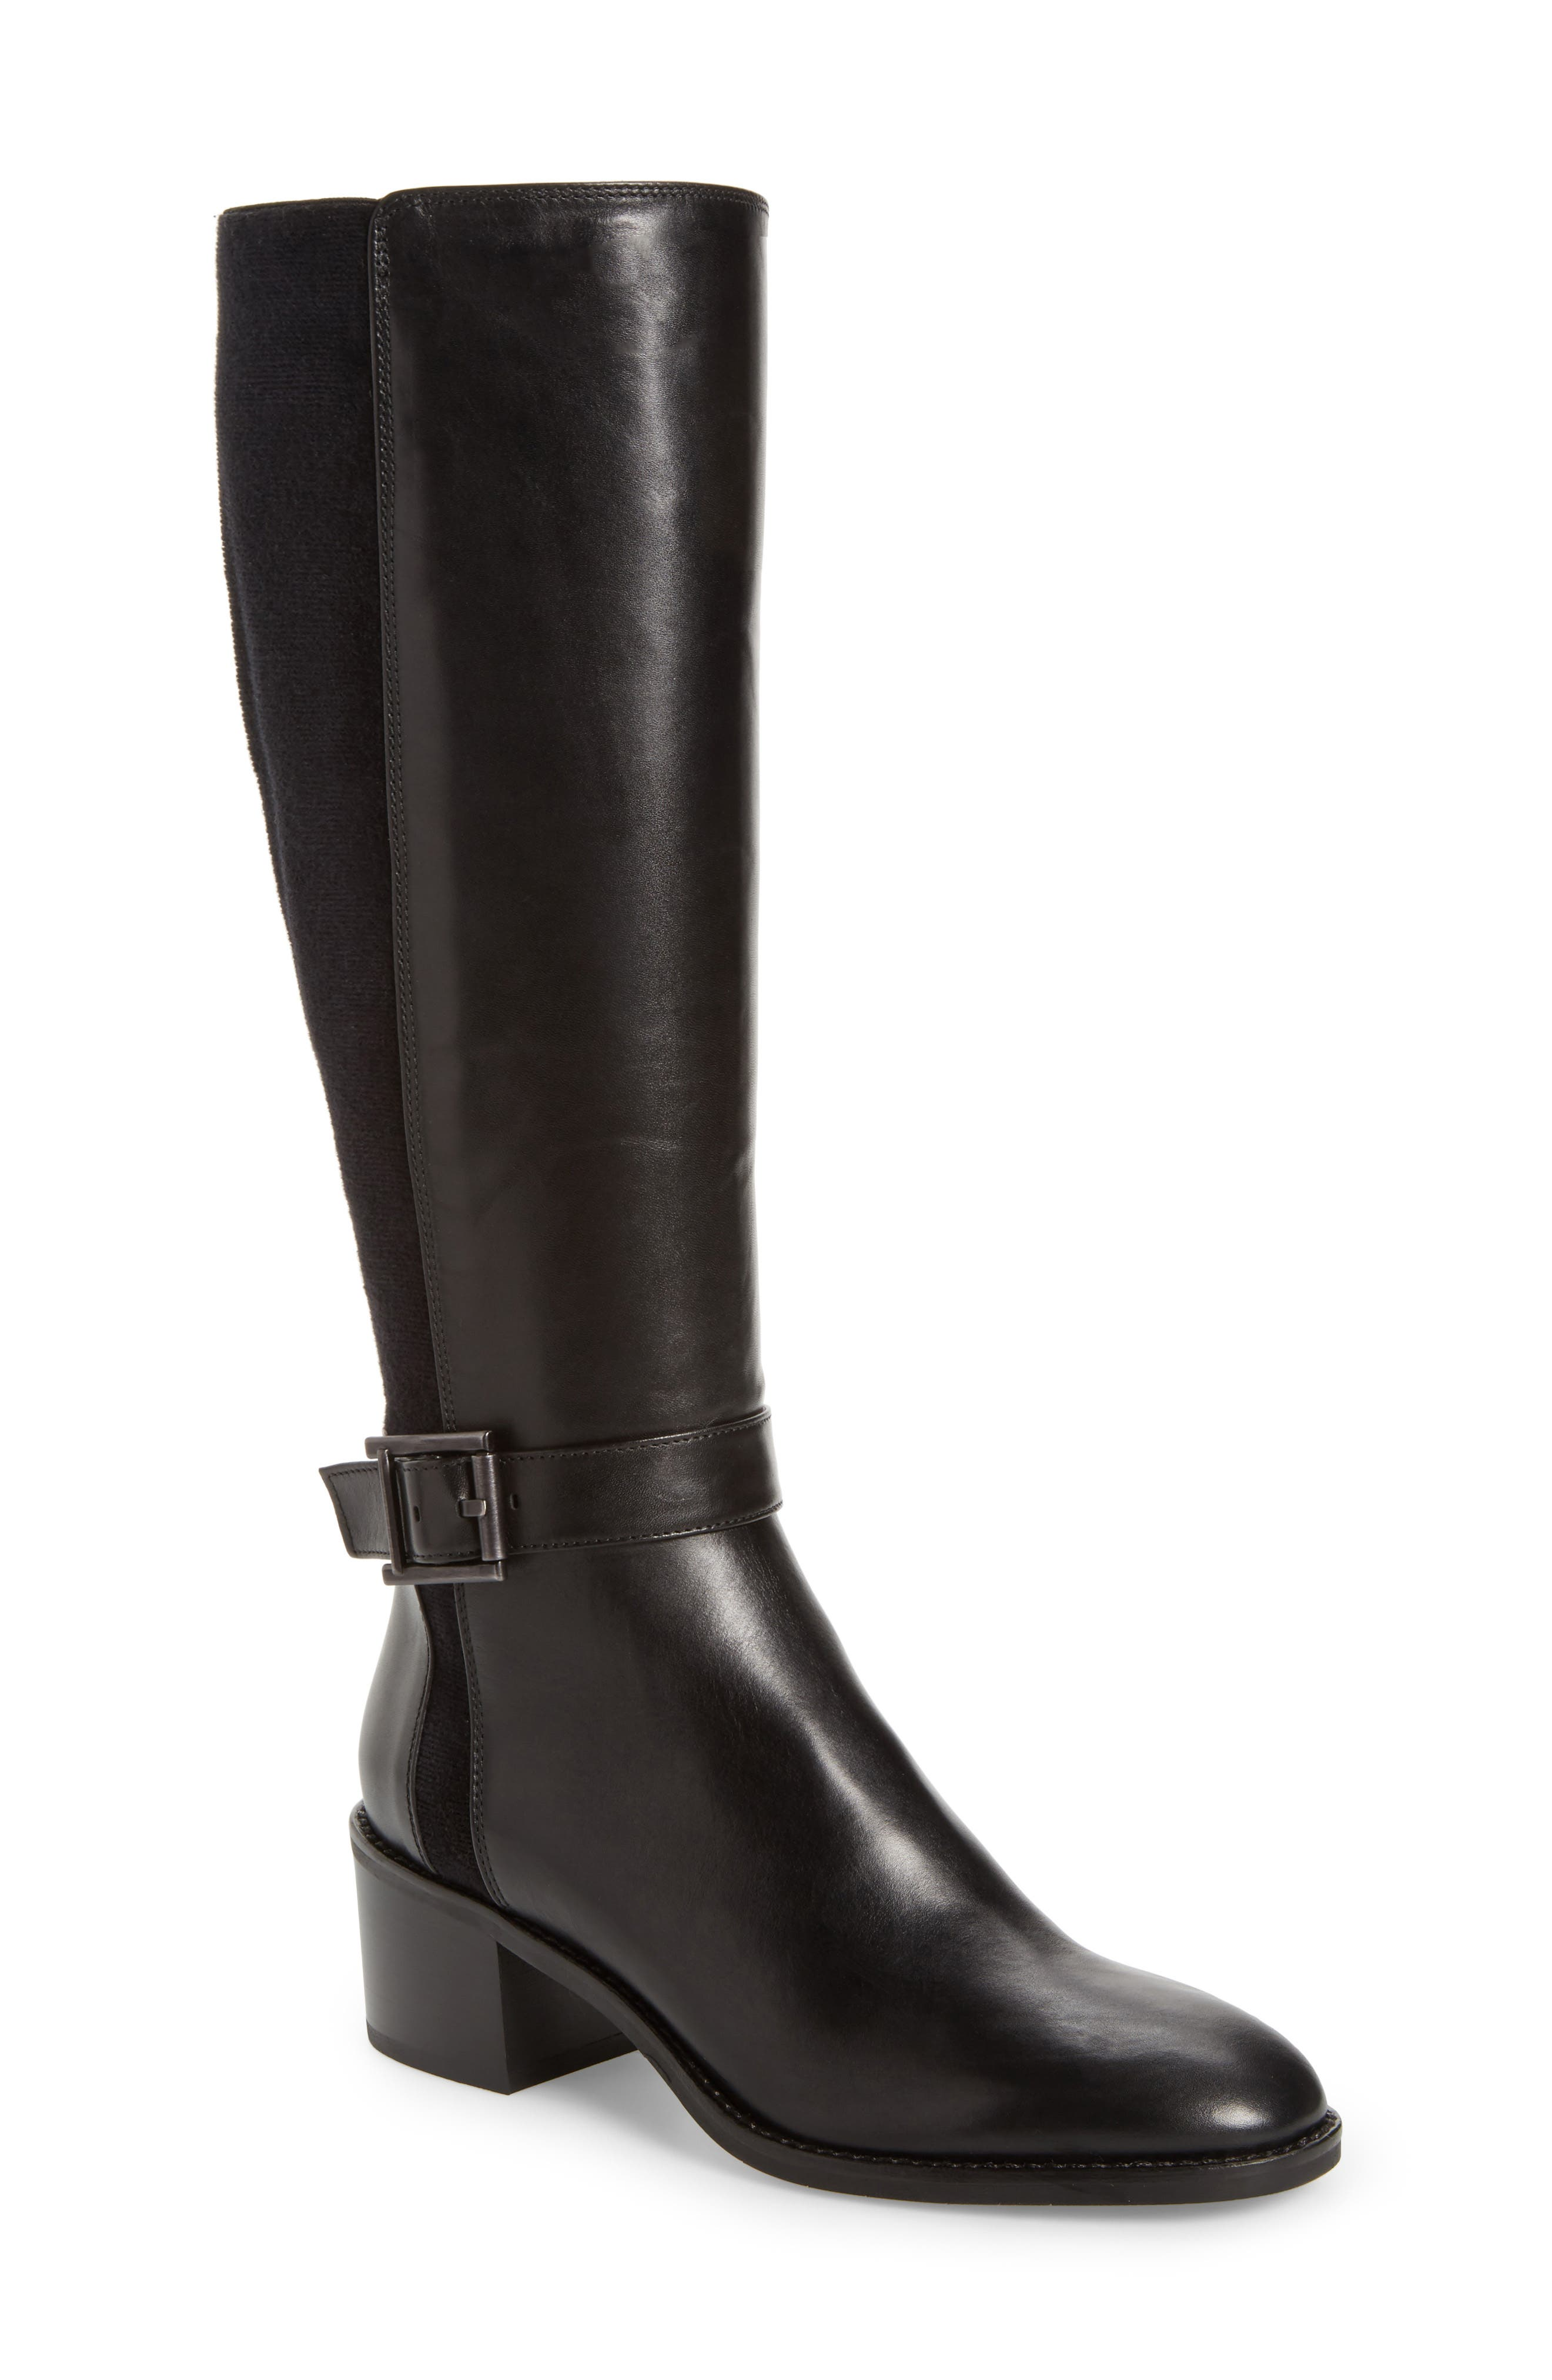 Joanna Weatherproof Tall Boot,                             Main thumbnail 1, color,                             Black